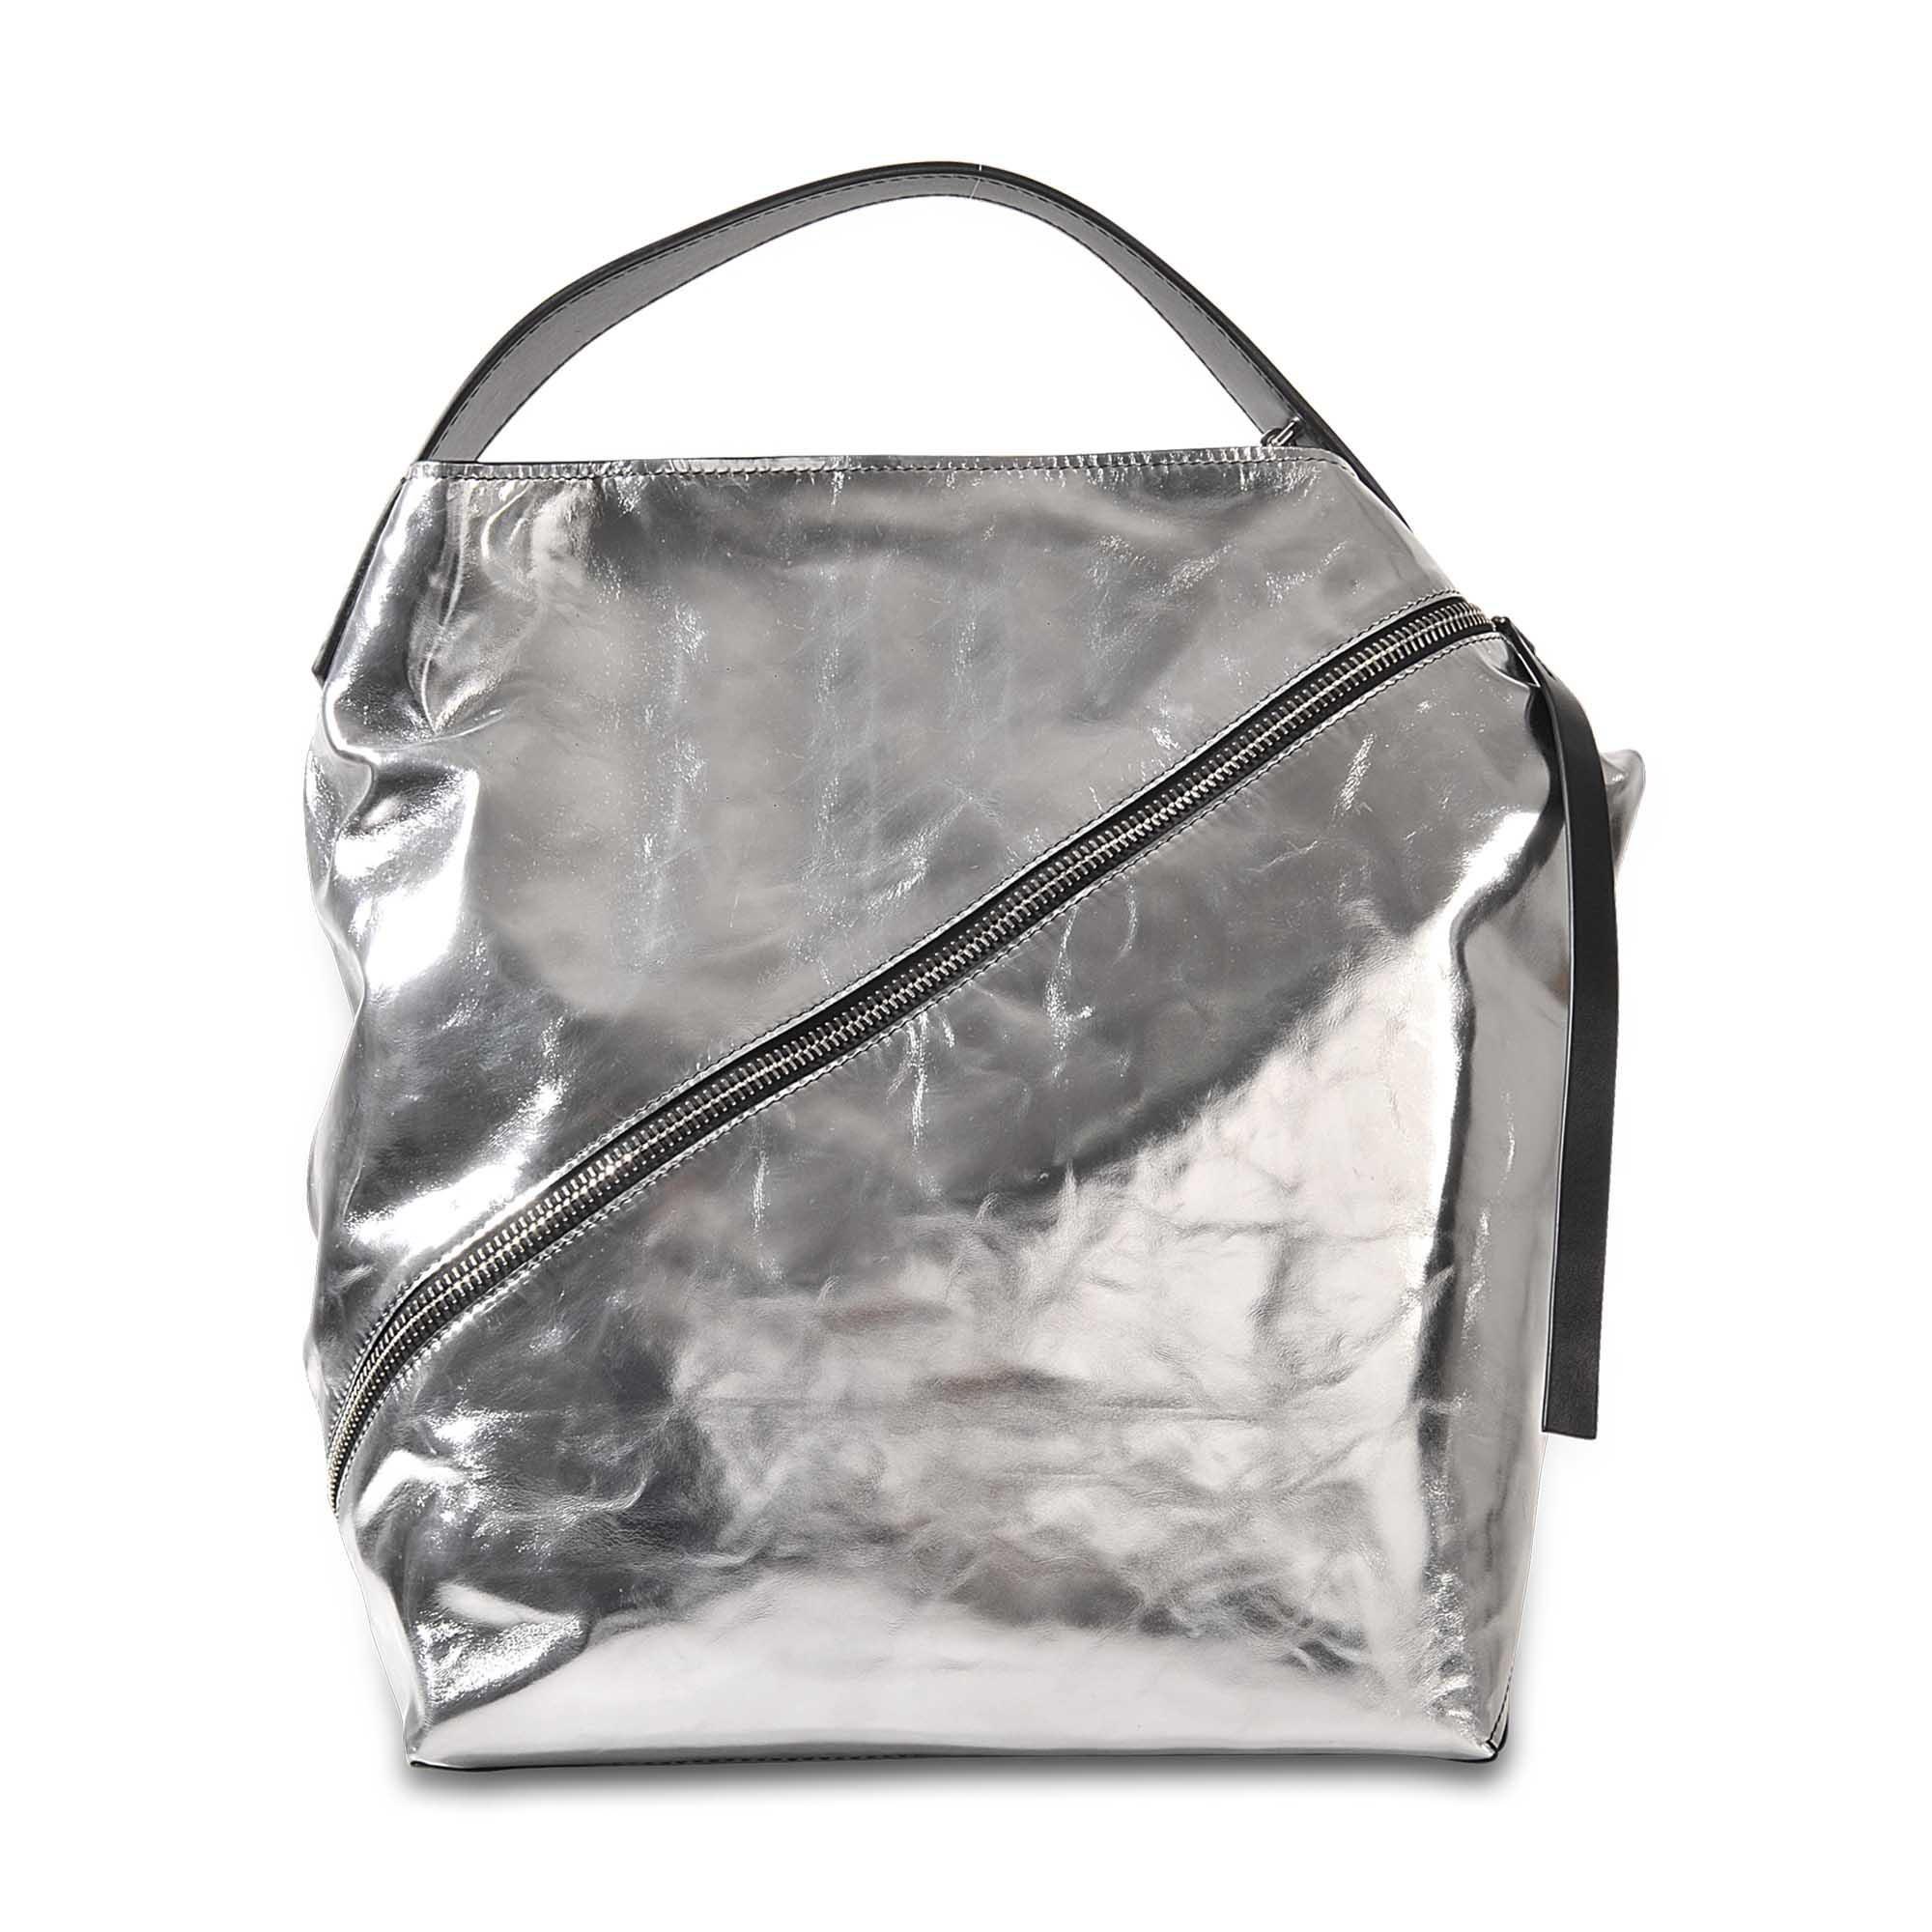 Lyst - Proenza Schouler Medium Hobo Soft Metallic Leather c57f8c8ee79e2